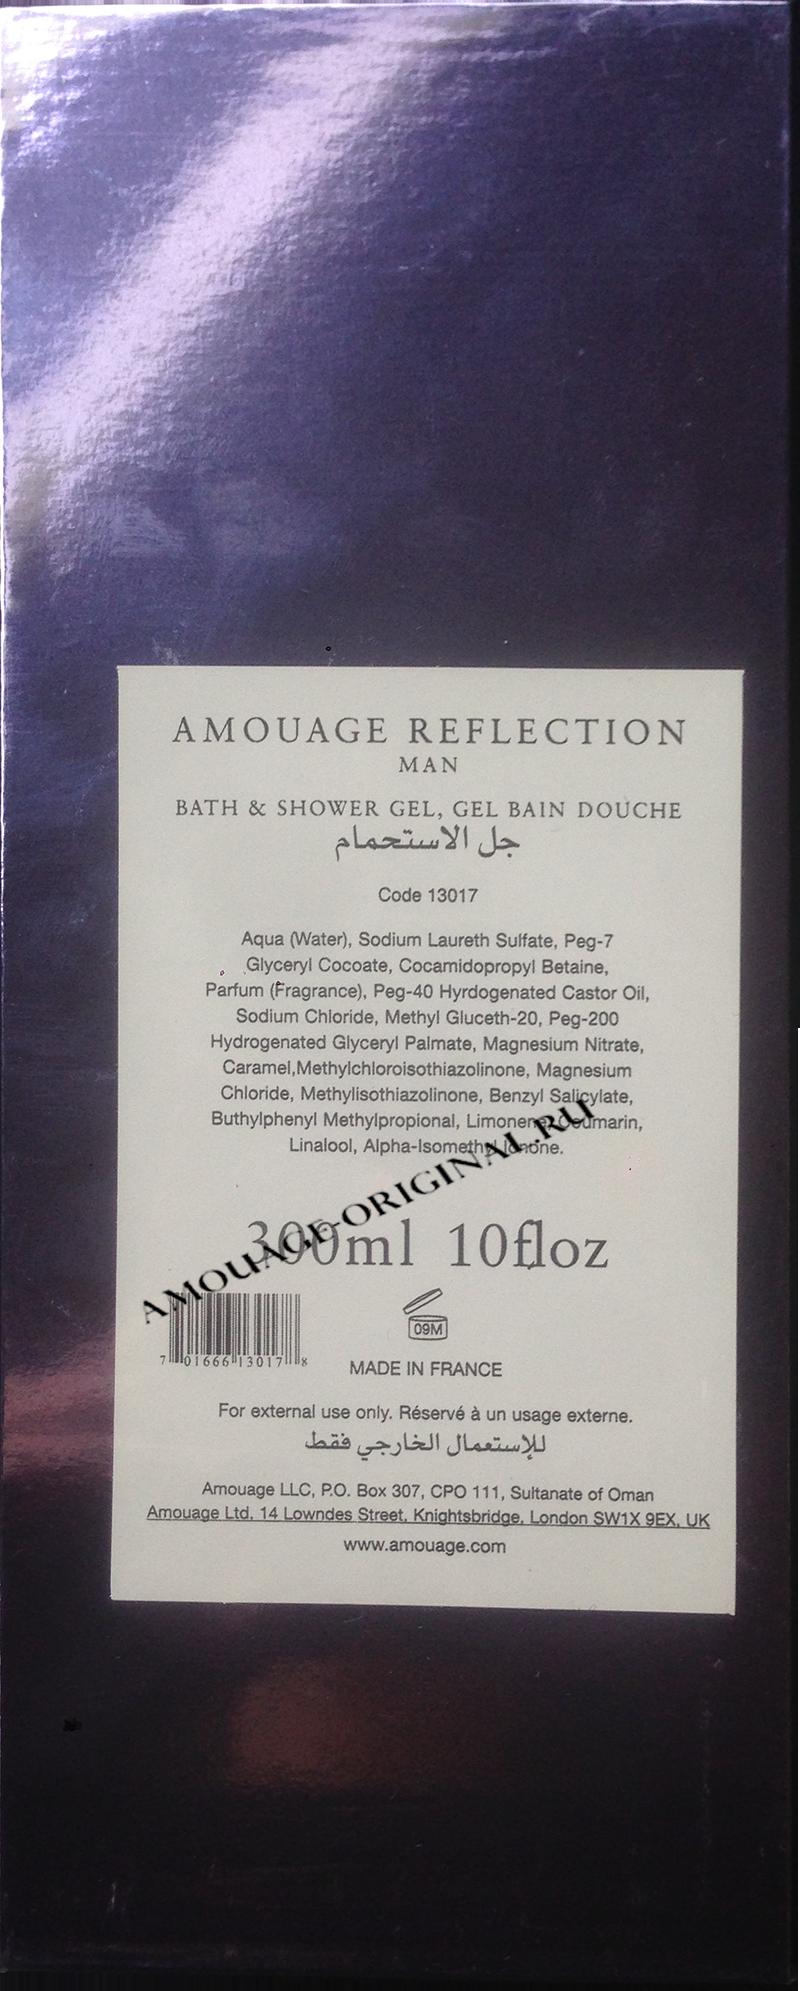 Amouage Reflection man Shower gel